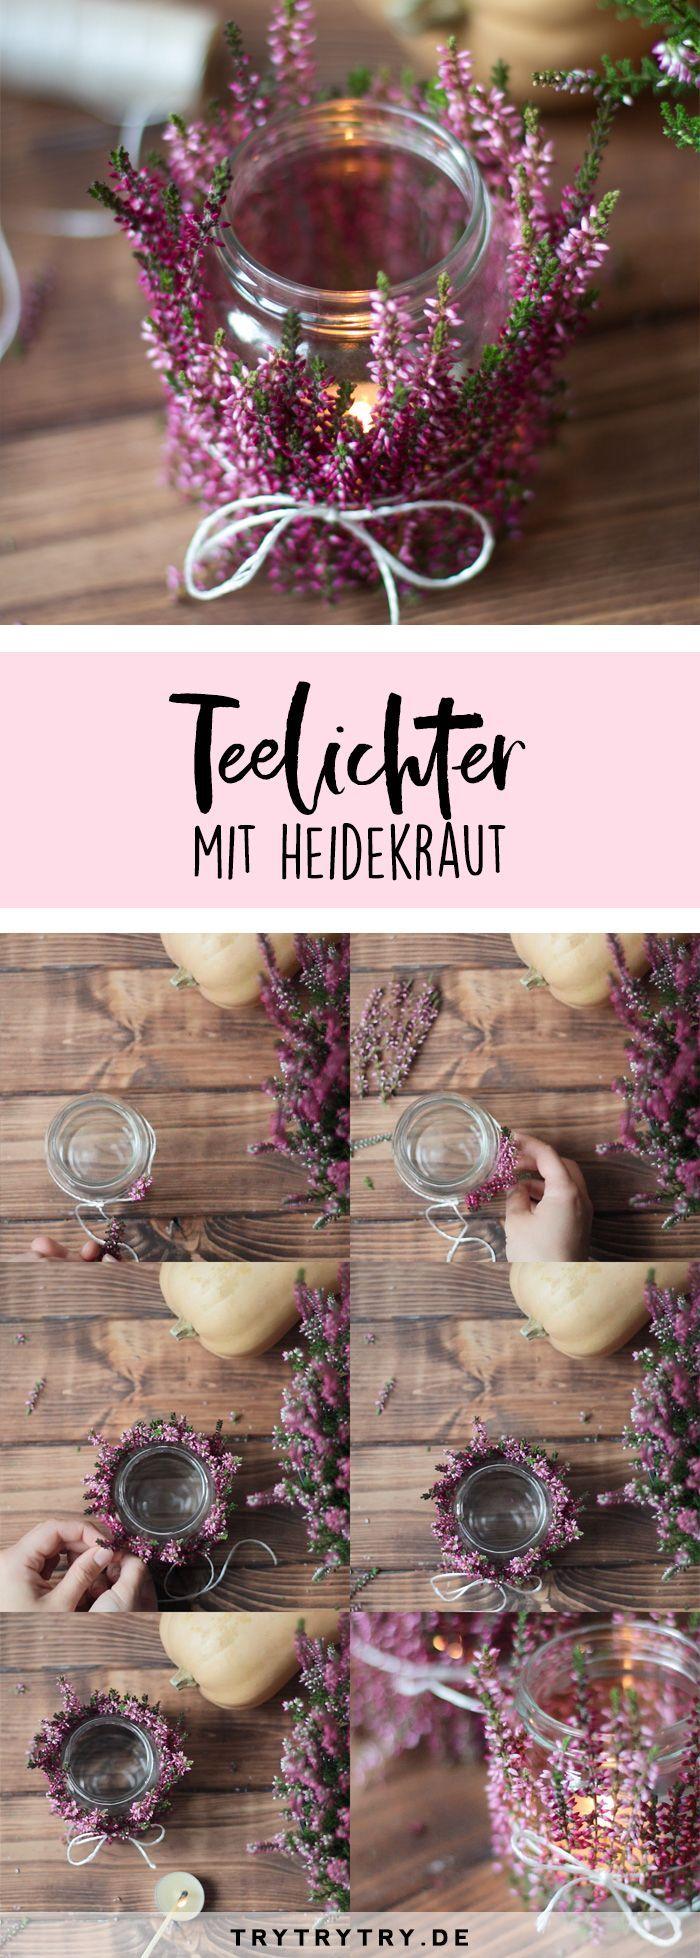 Photo of Natur-Teelichter mit Heidekraut